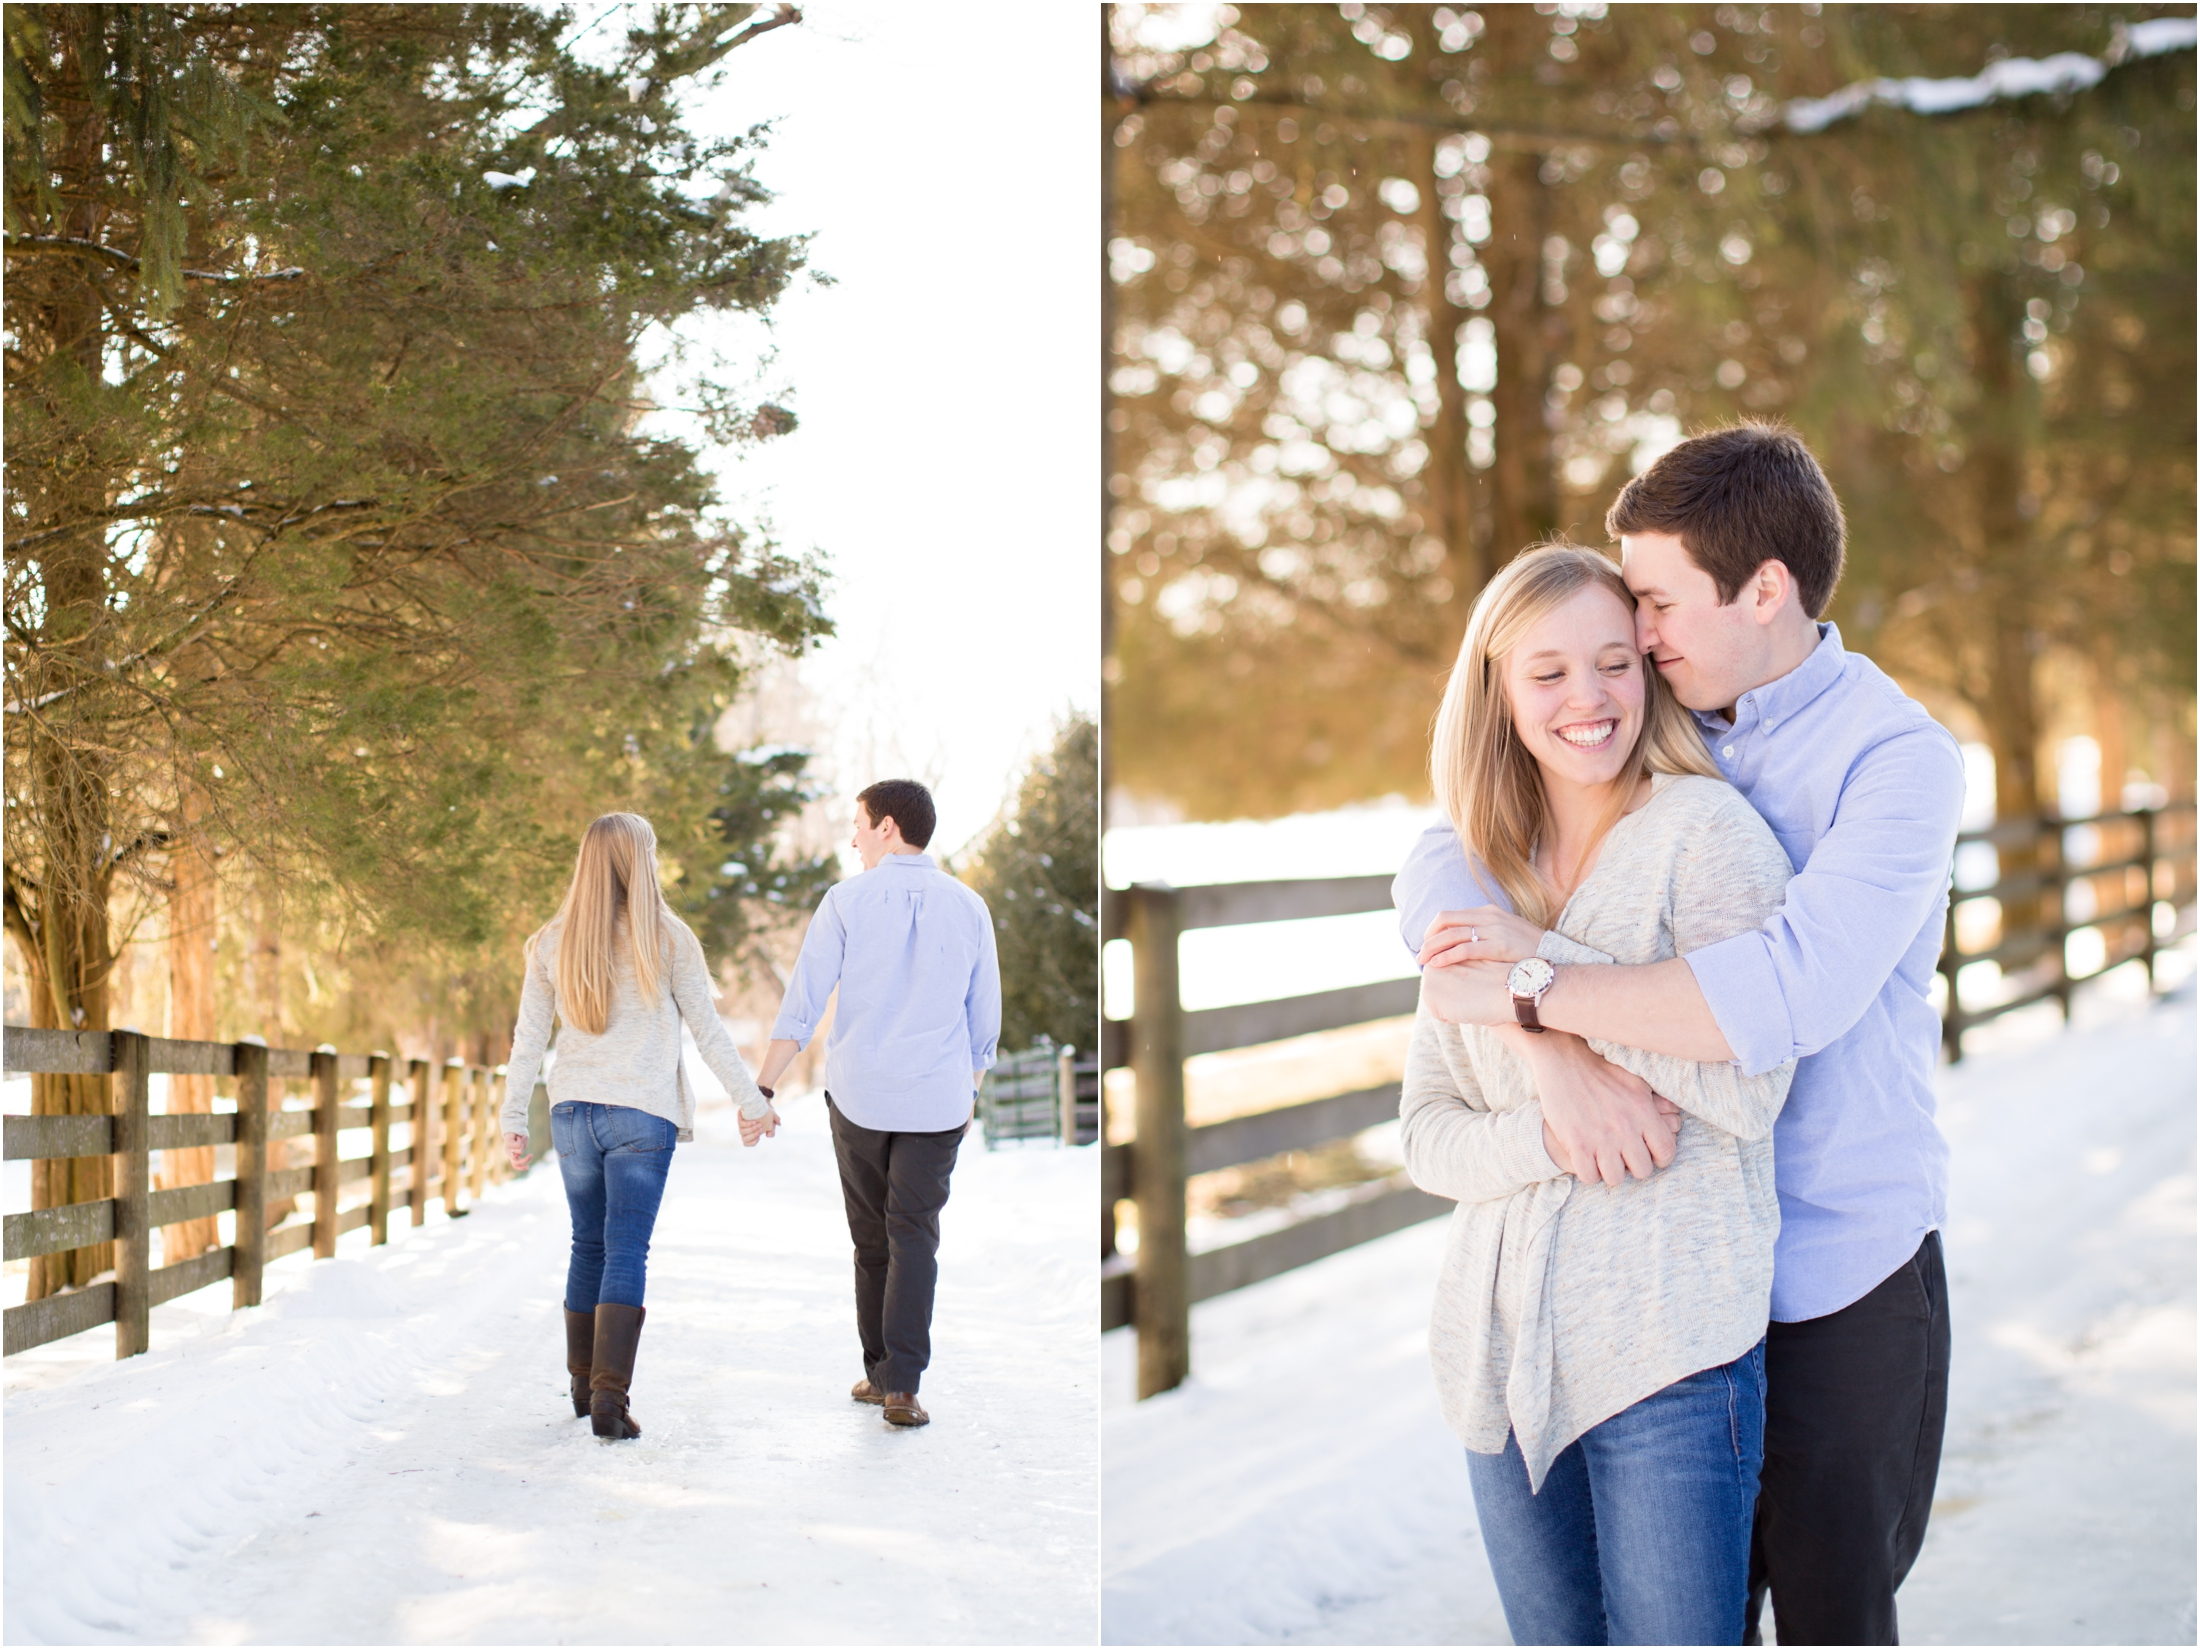 Emily-Caleb-Engaged-61.jpg